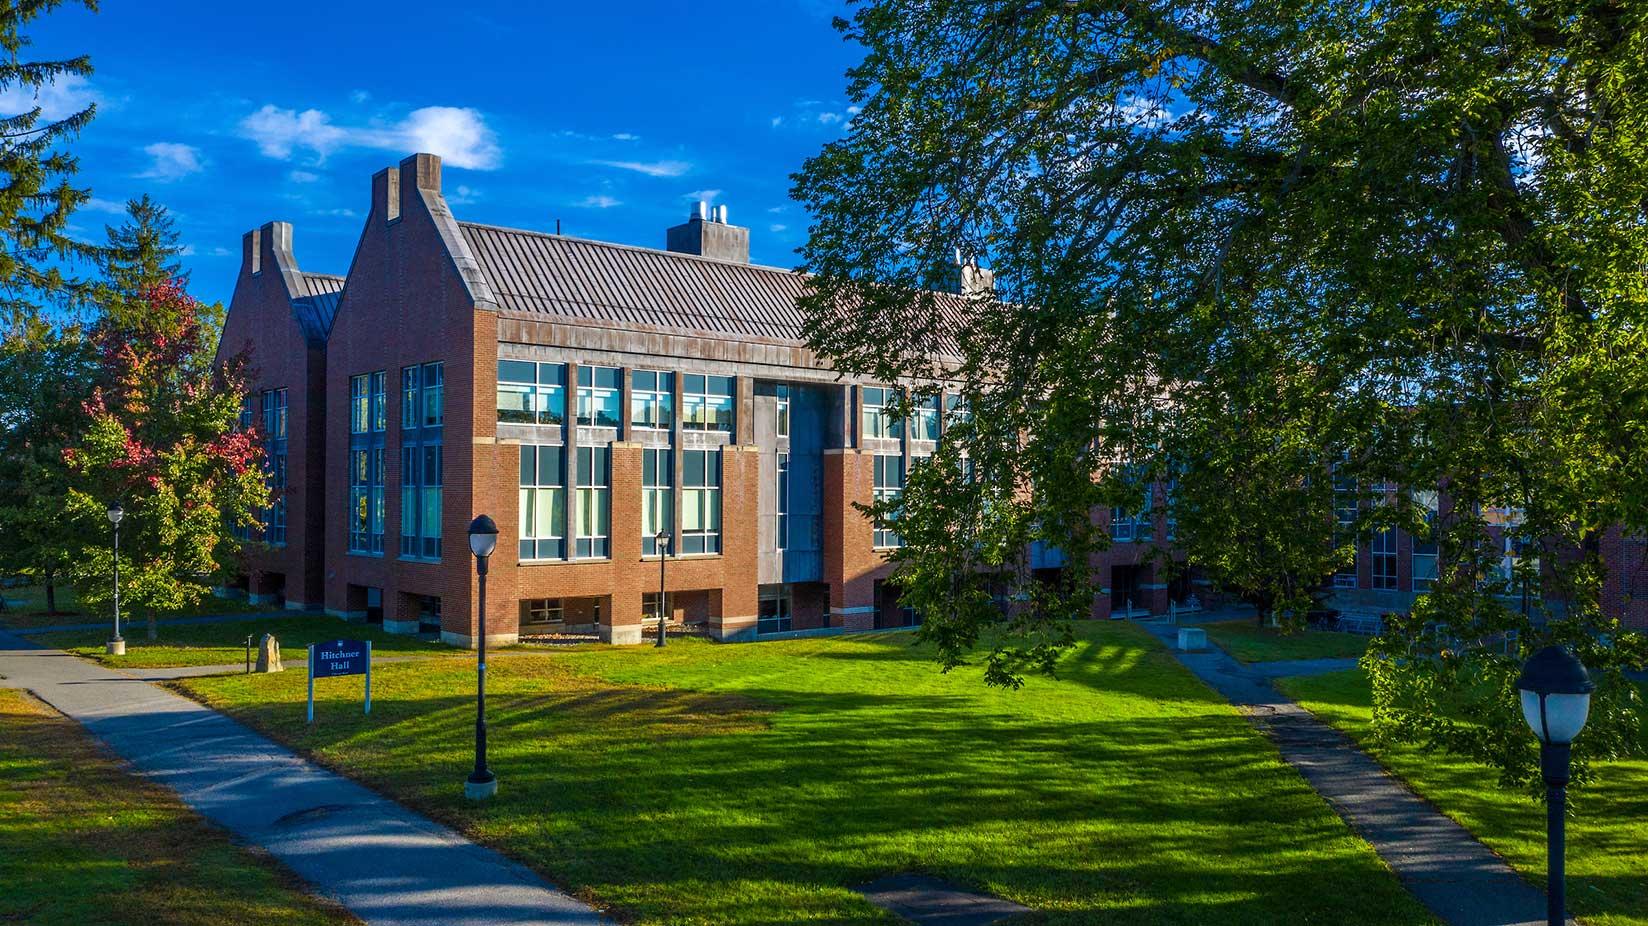 image of campus building